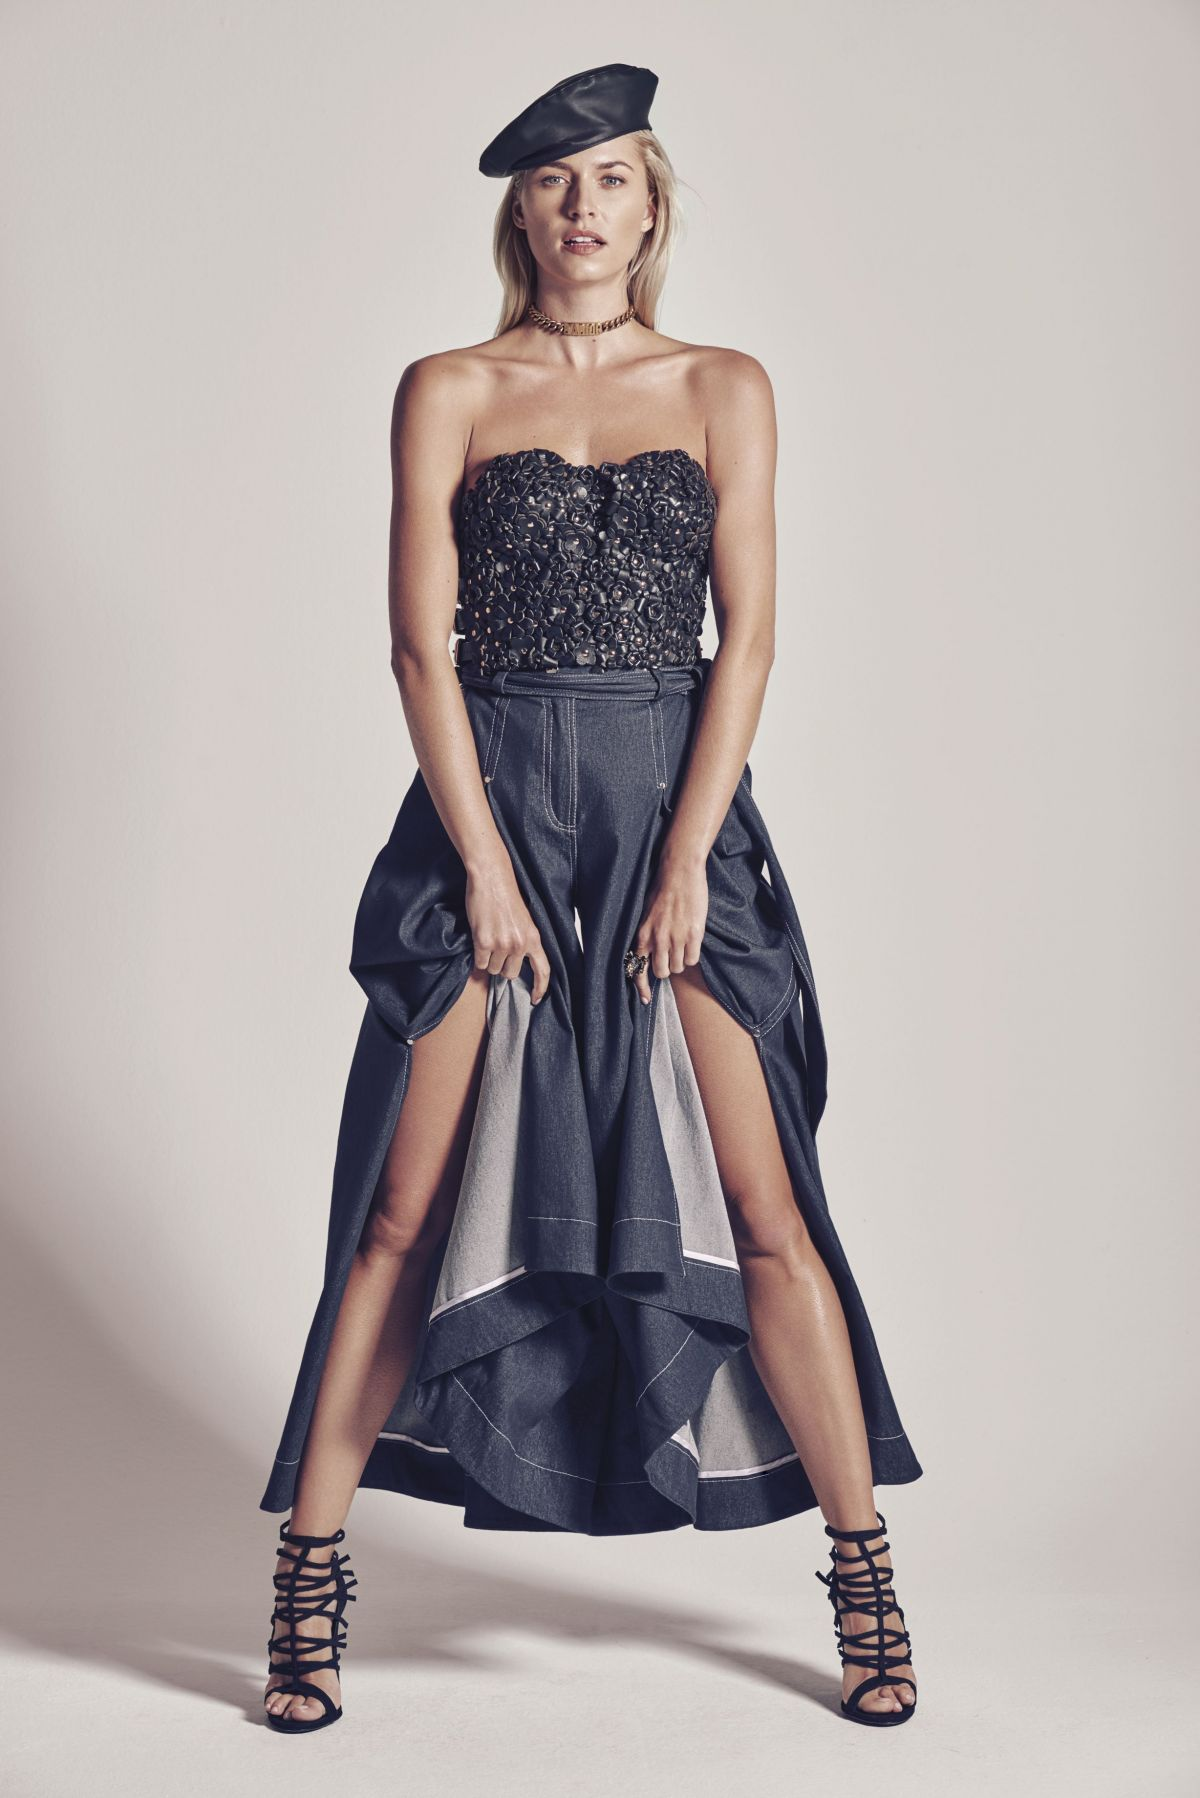 Lena gercke fashion spot